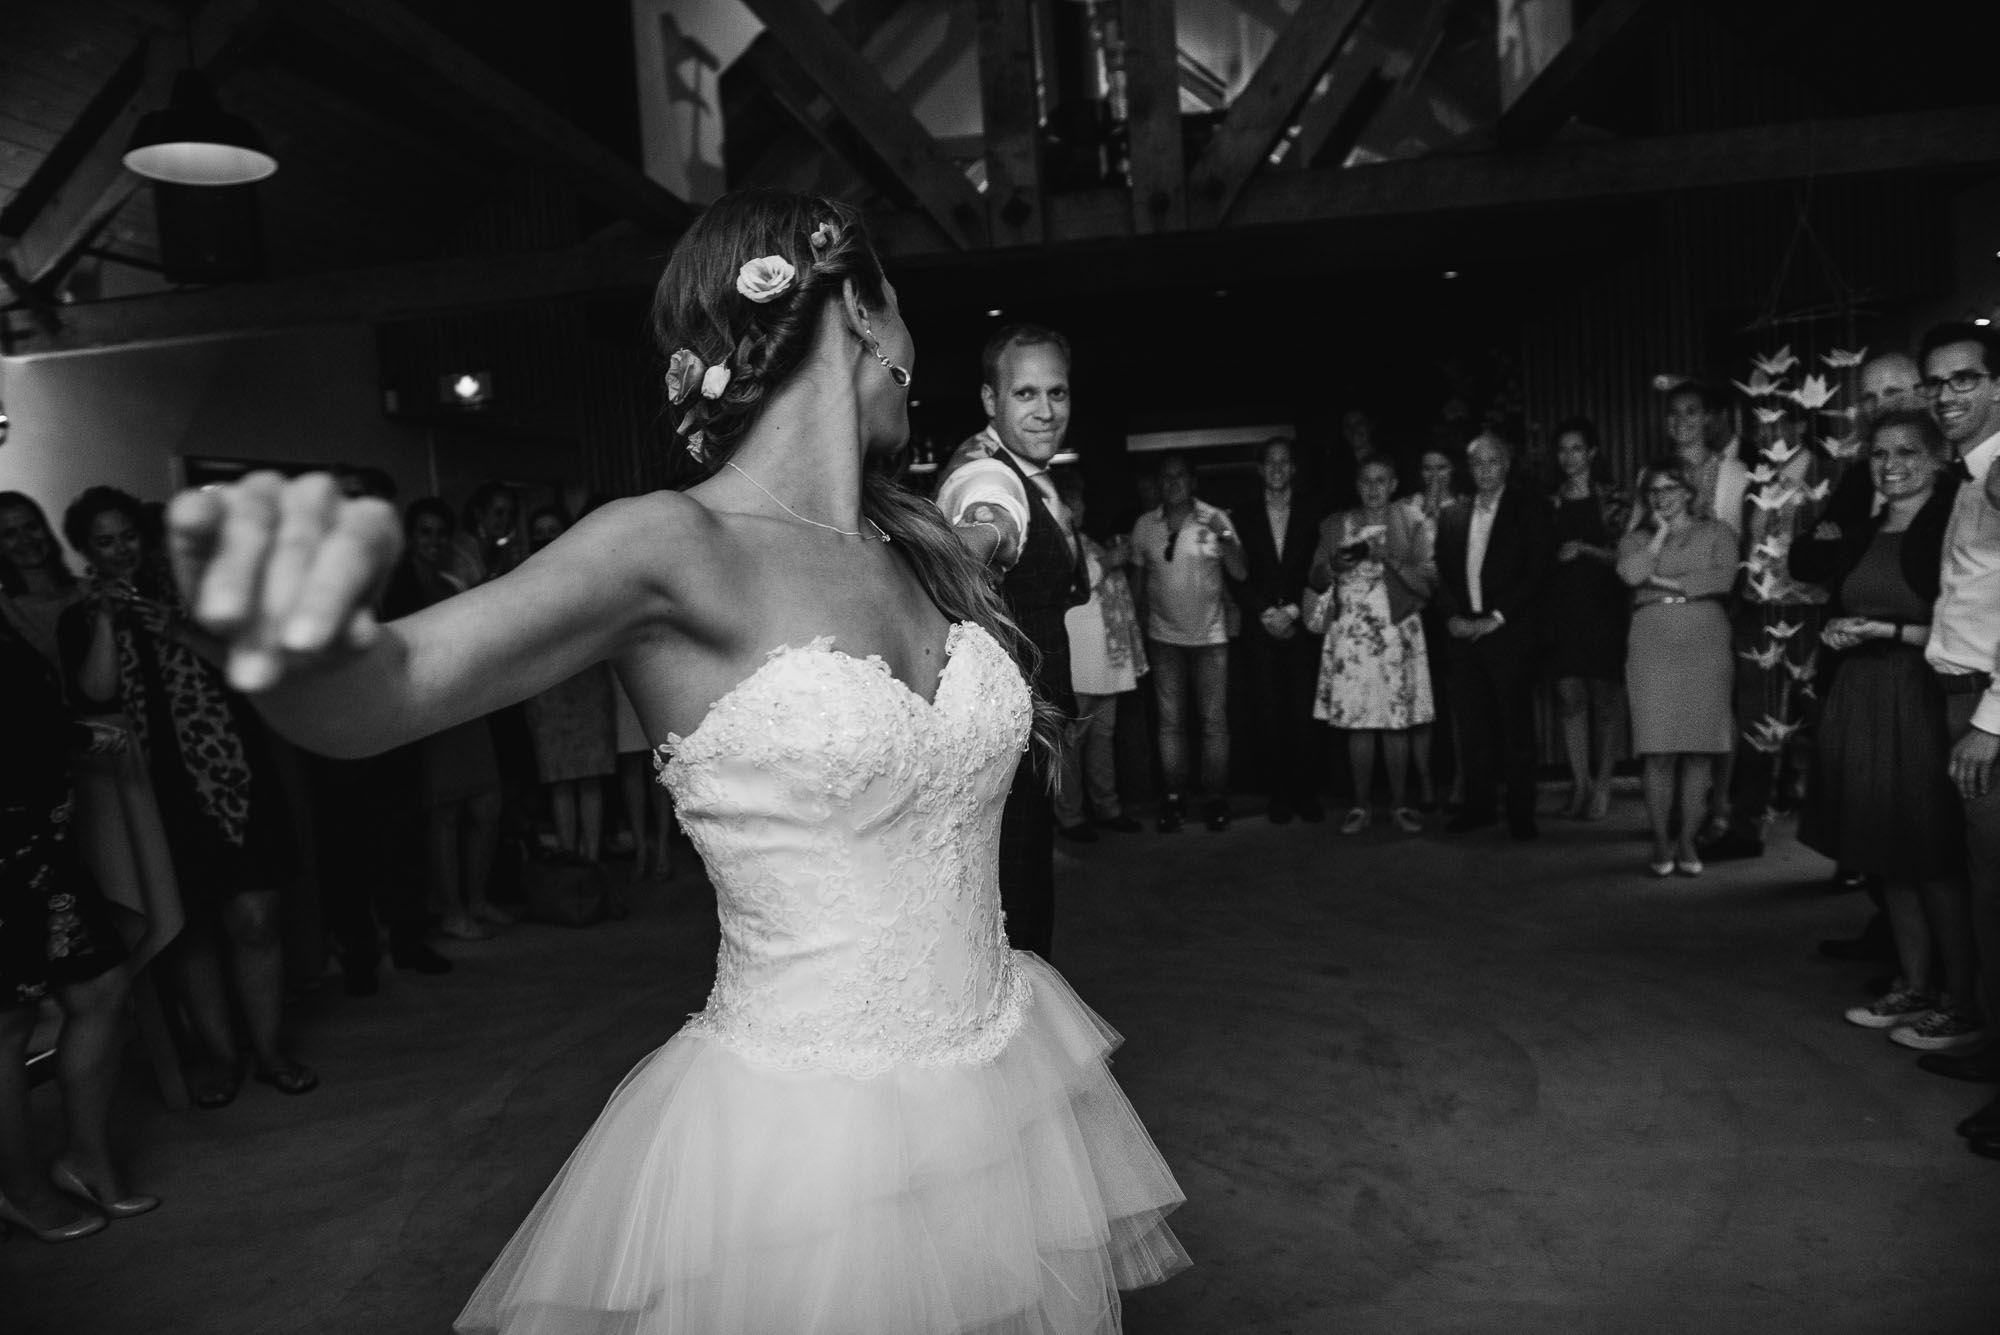 openingsdans bruiloft Delft